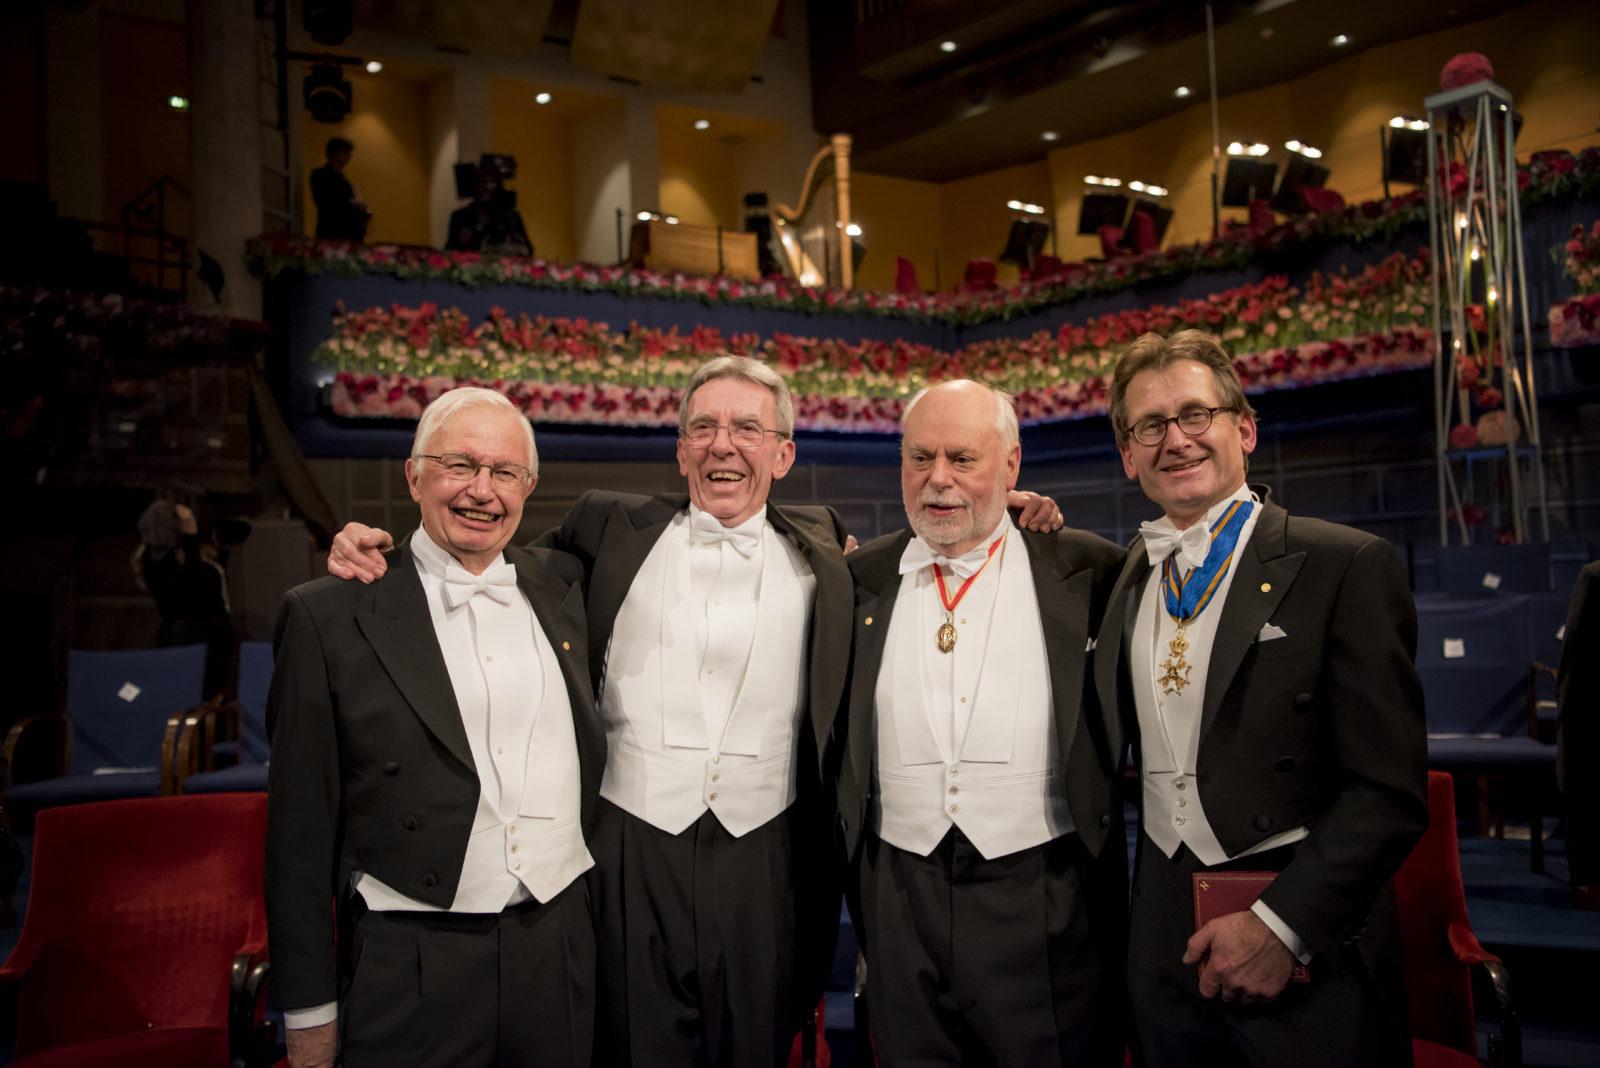 2016 Nobel Prize in Chemistry winners Fraser Stoddart, Jean-Pierre Sauvage, & Ben Feringa with Jean-Marie Lehn